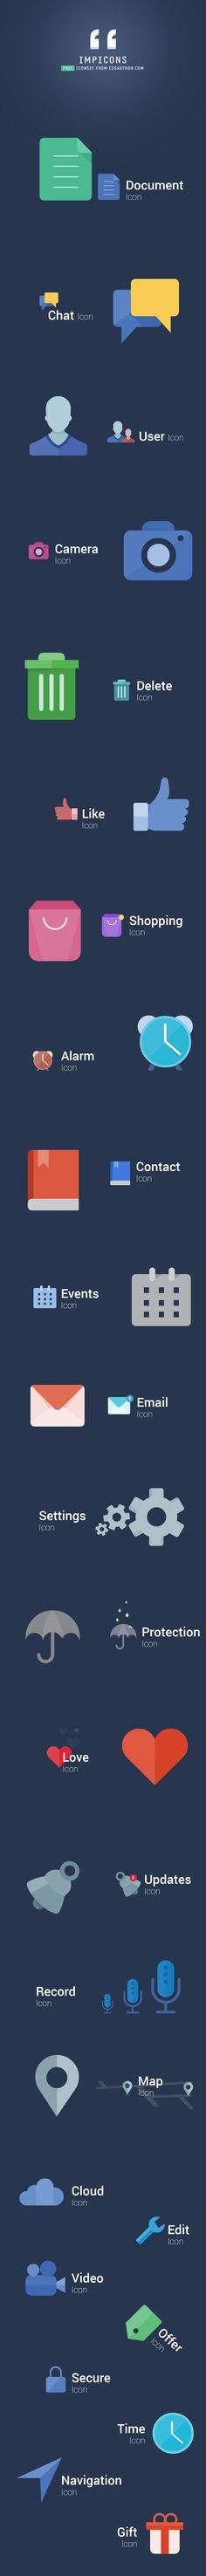 IMPICONS - Modern Flat style Free Icon Set - Freebie No: 116